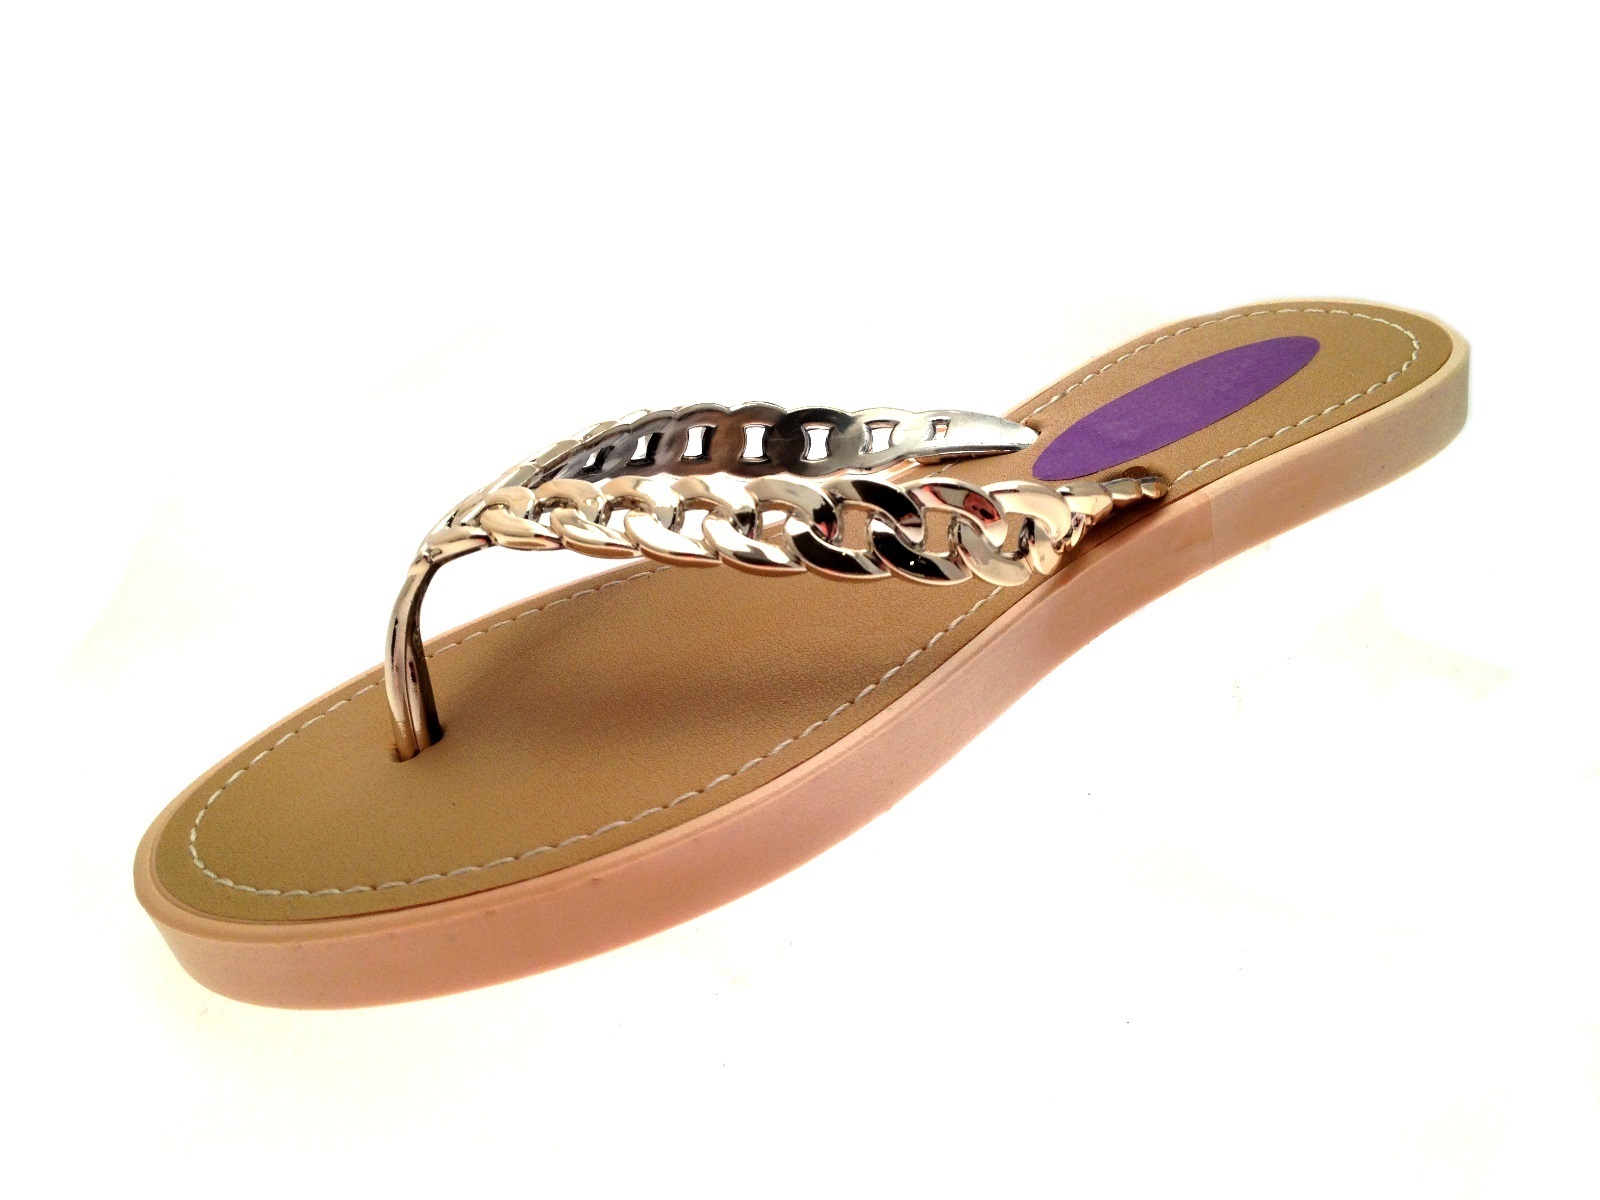 0bc5db318394 Womens Summer Sandals Chain Toe Posts Metallic Beach Flip Flops ...